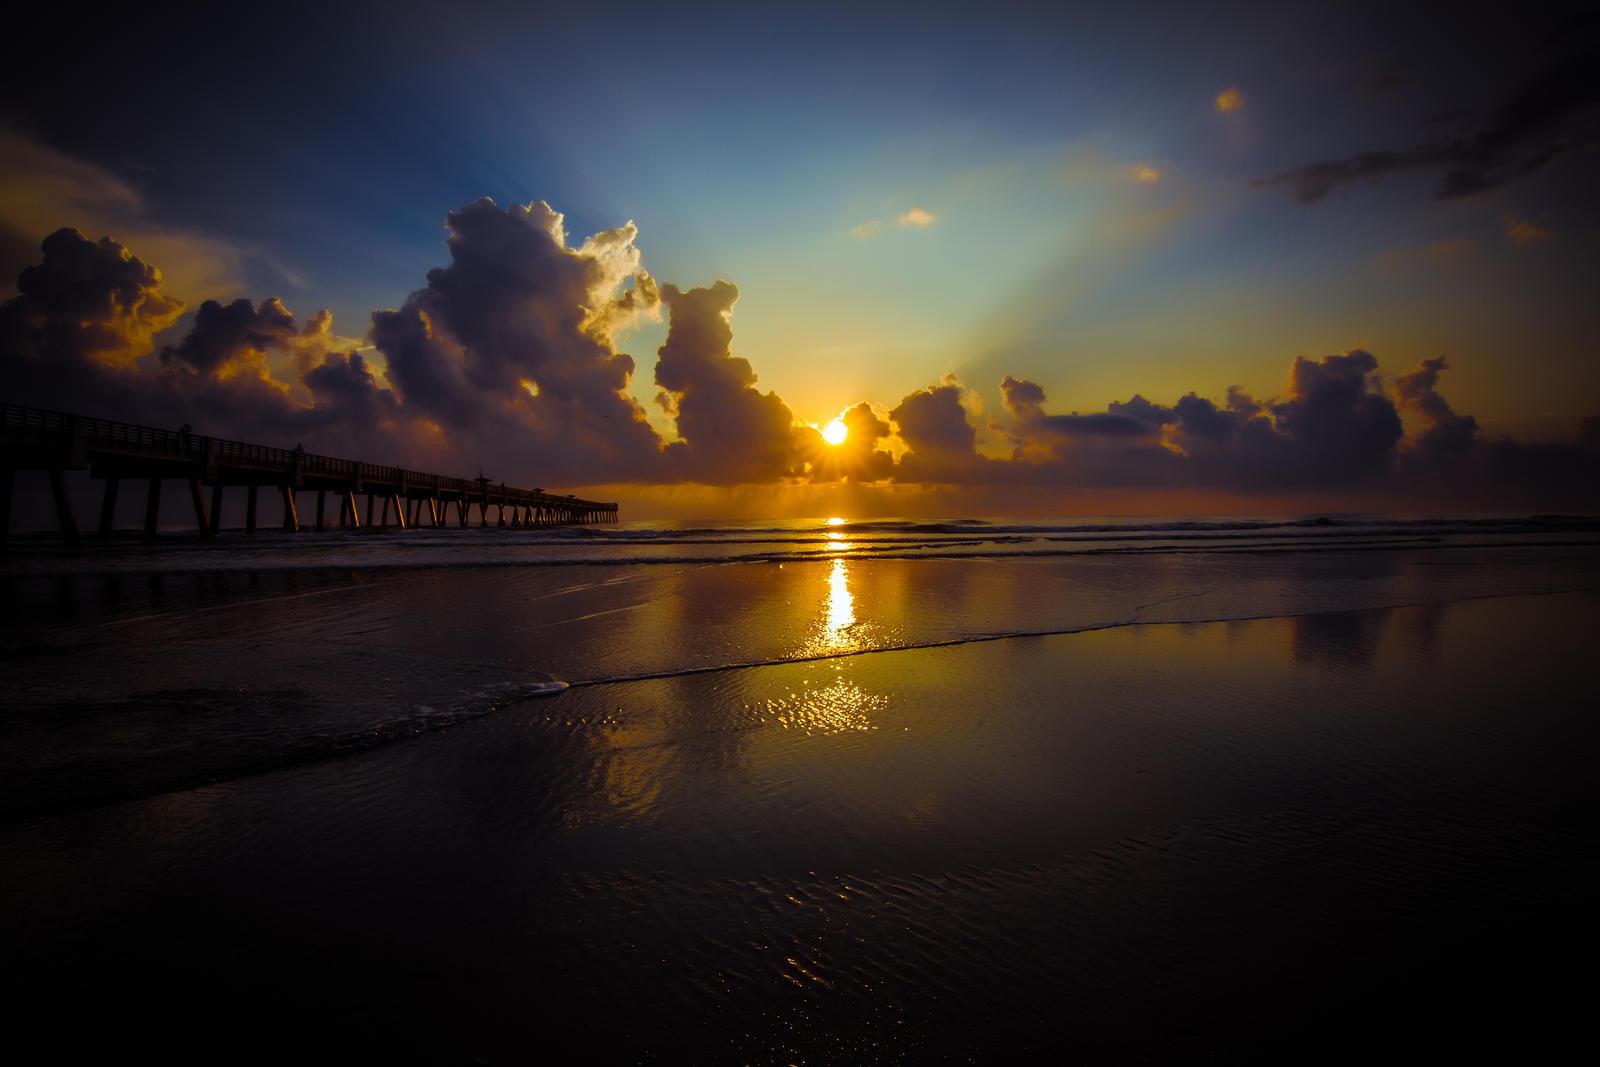 Jax. Beach Sunrise by 904PhotoPhactory